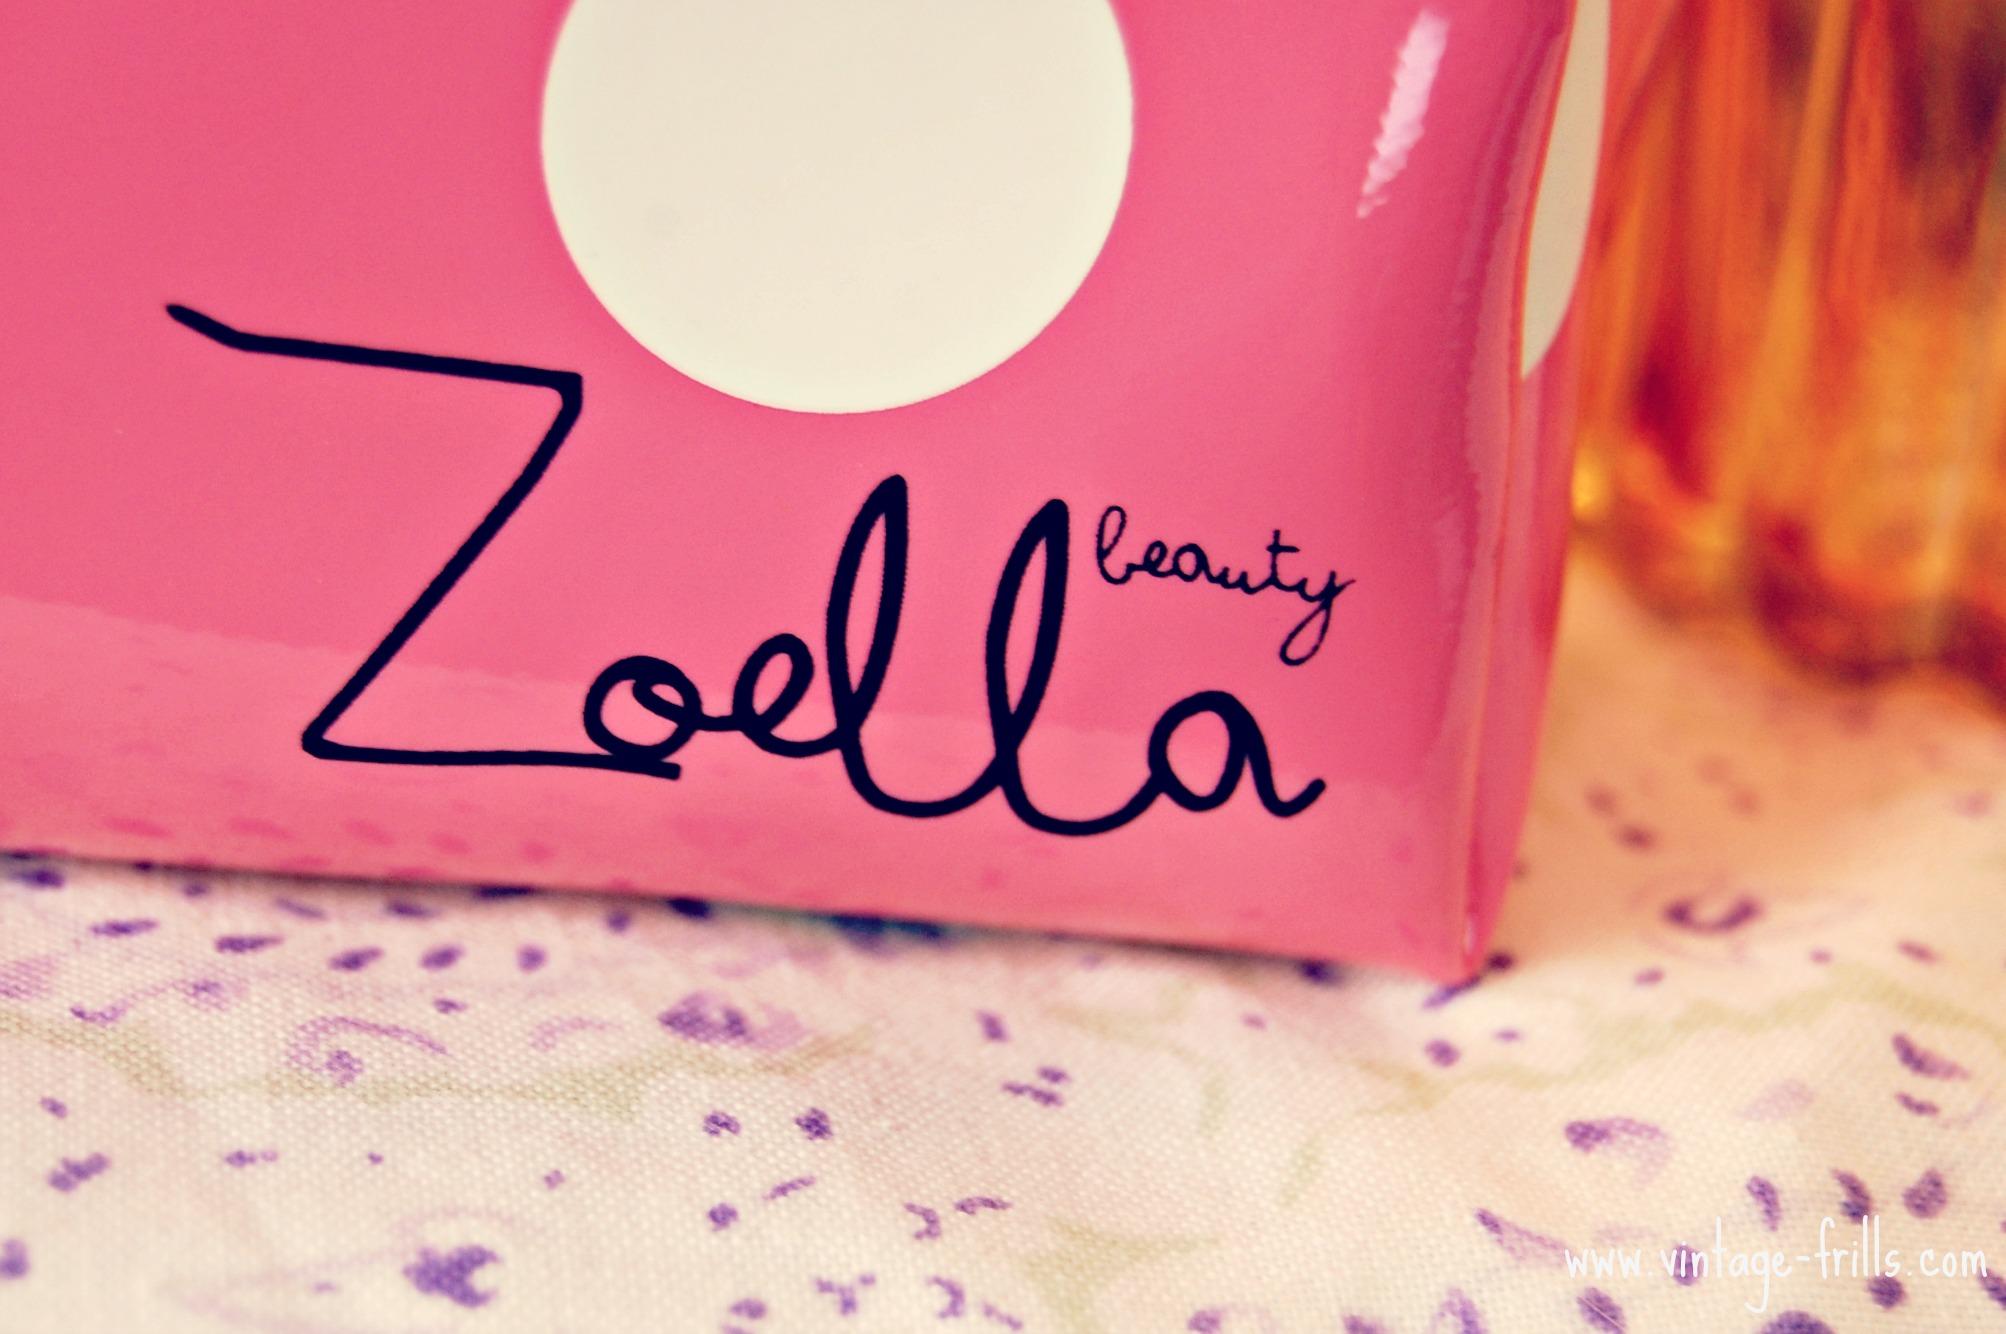 Zoella, Zoella Beauty, Zoella Make-up bag, Guinea Pig, Pink